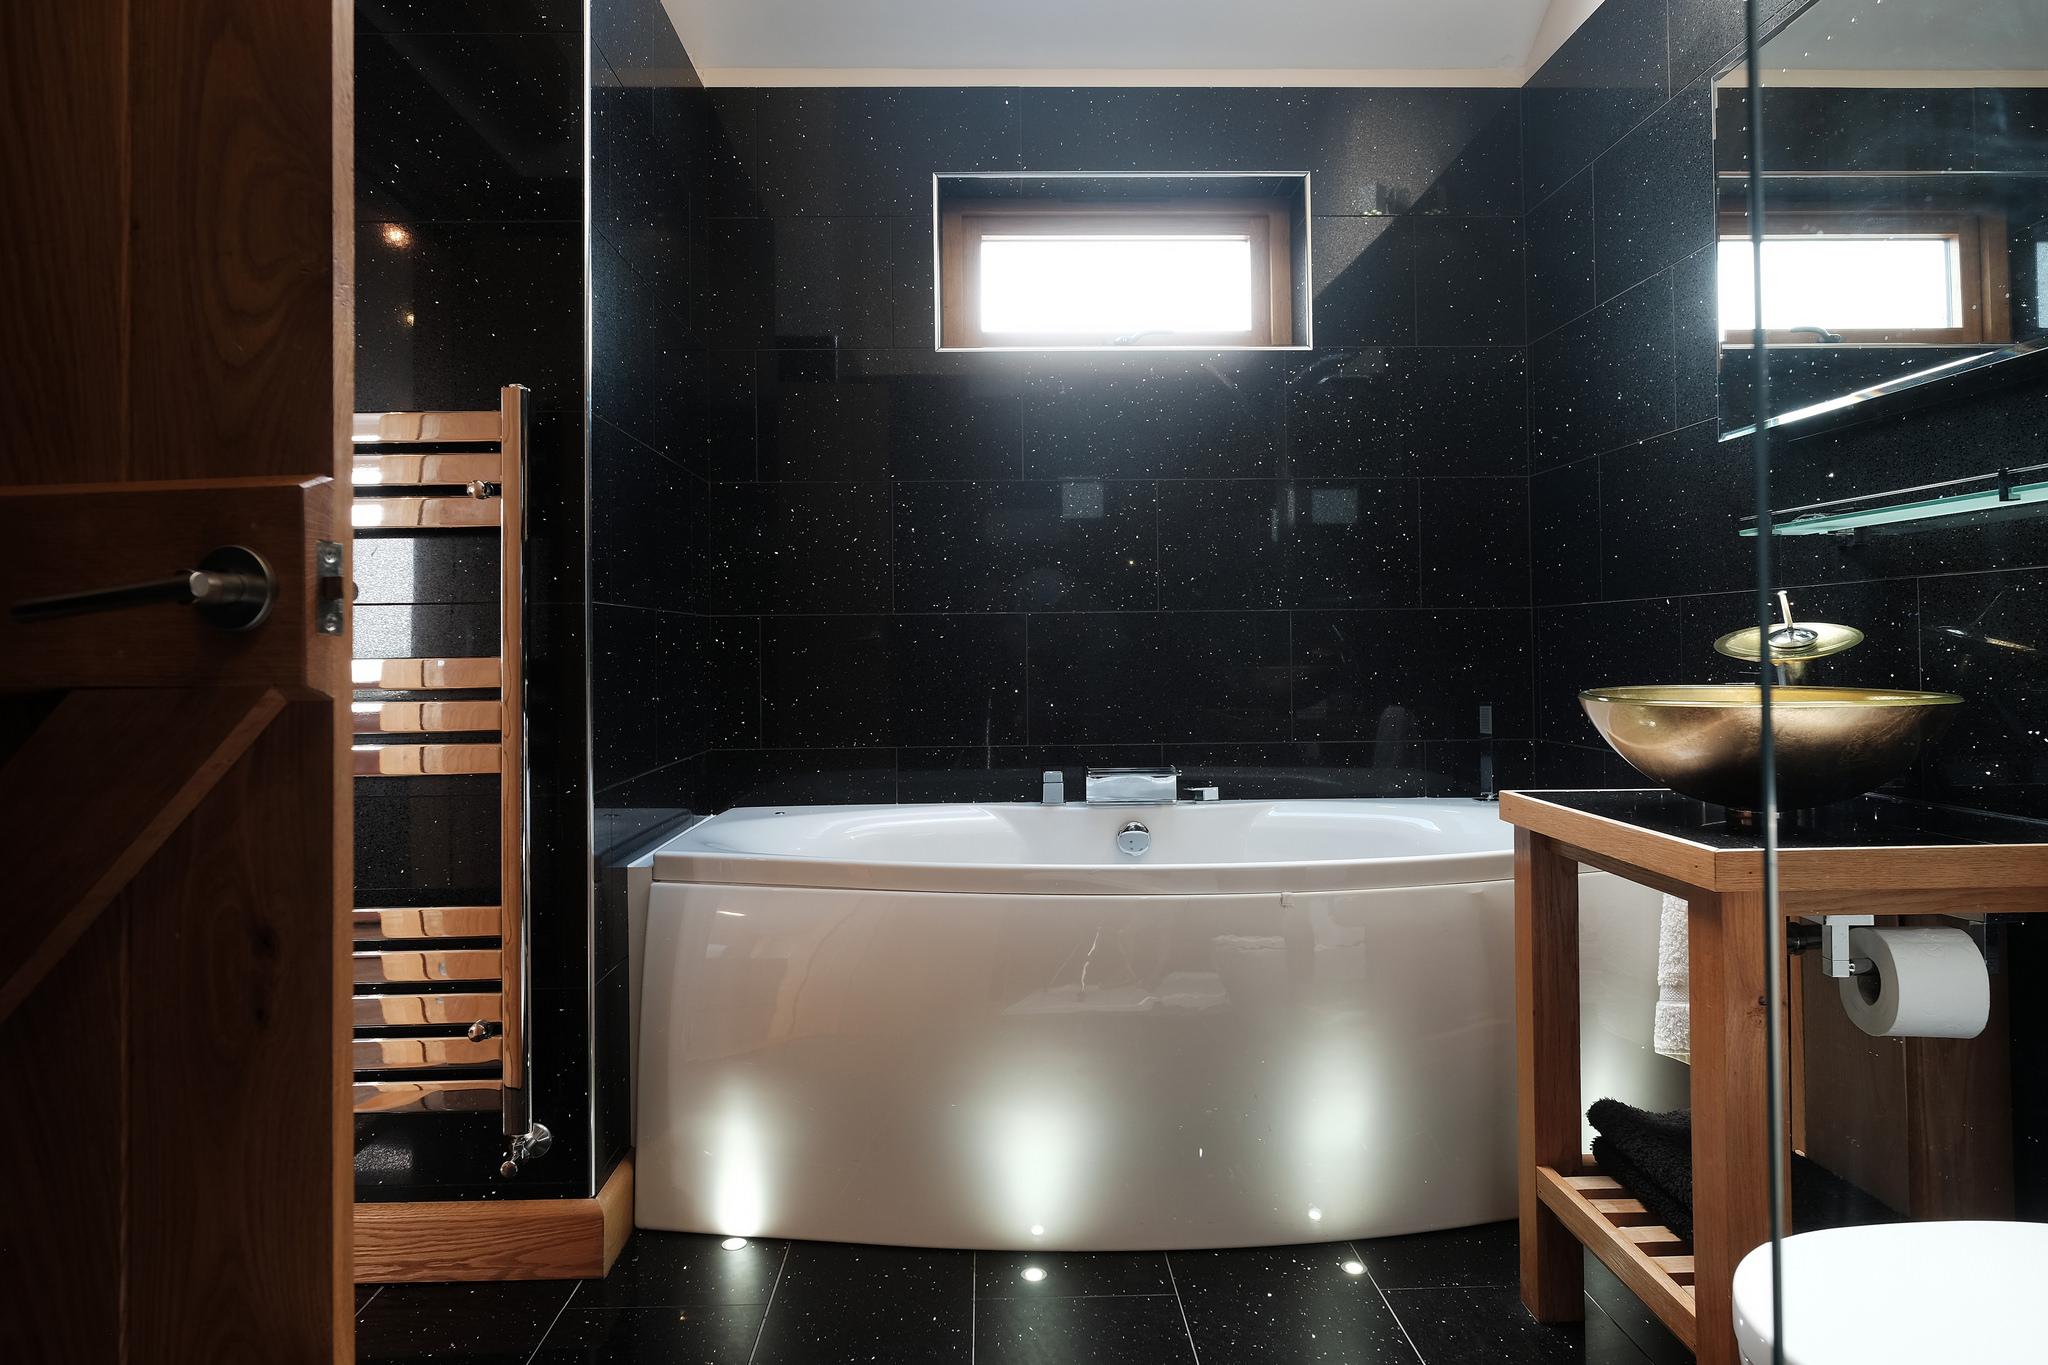 Spa bath with ground lighting